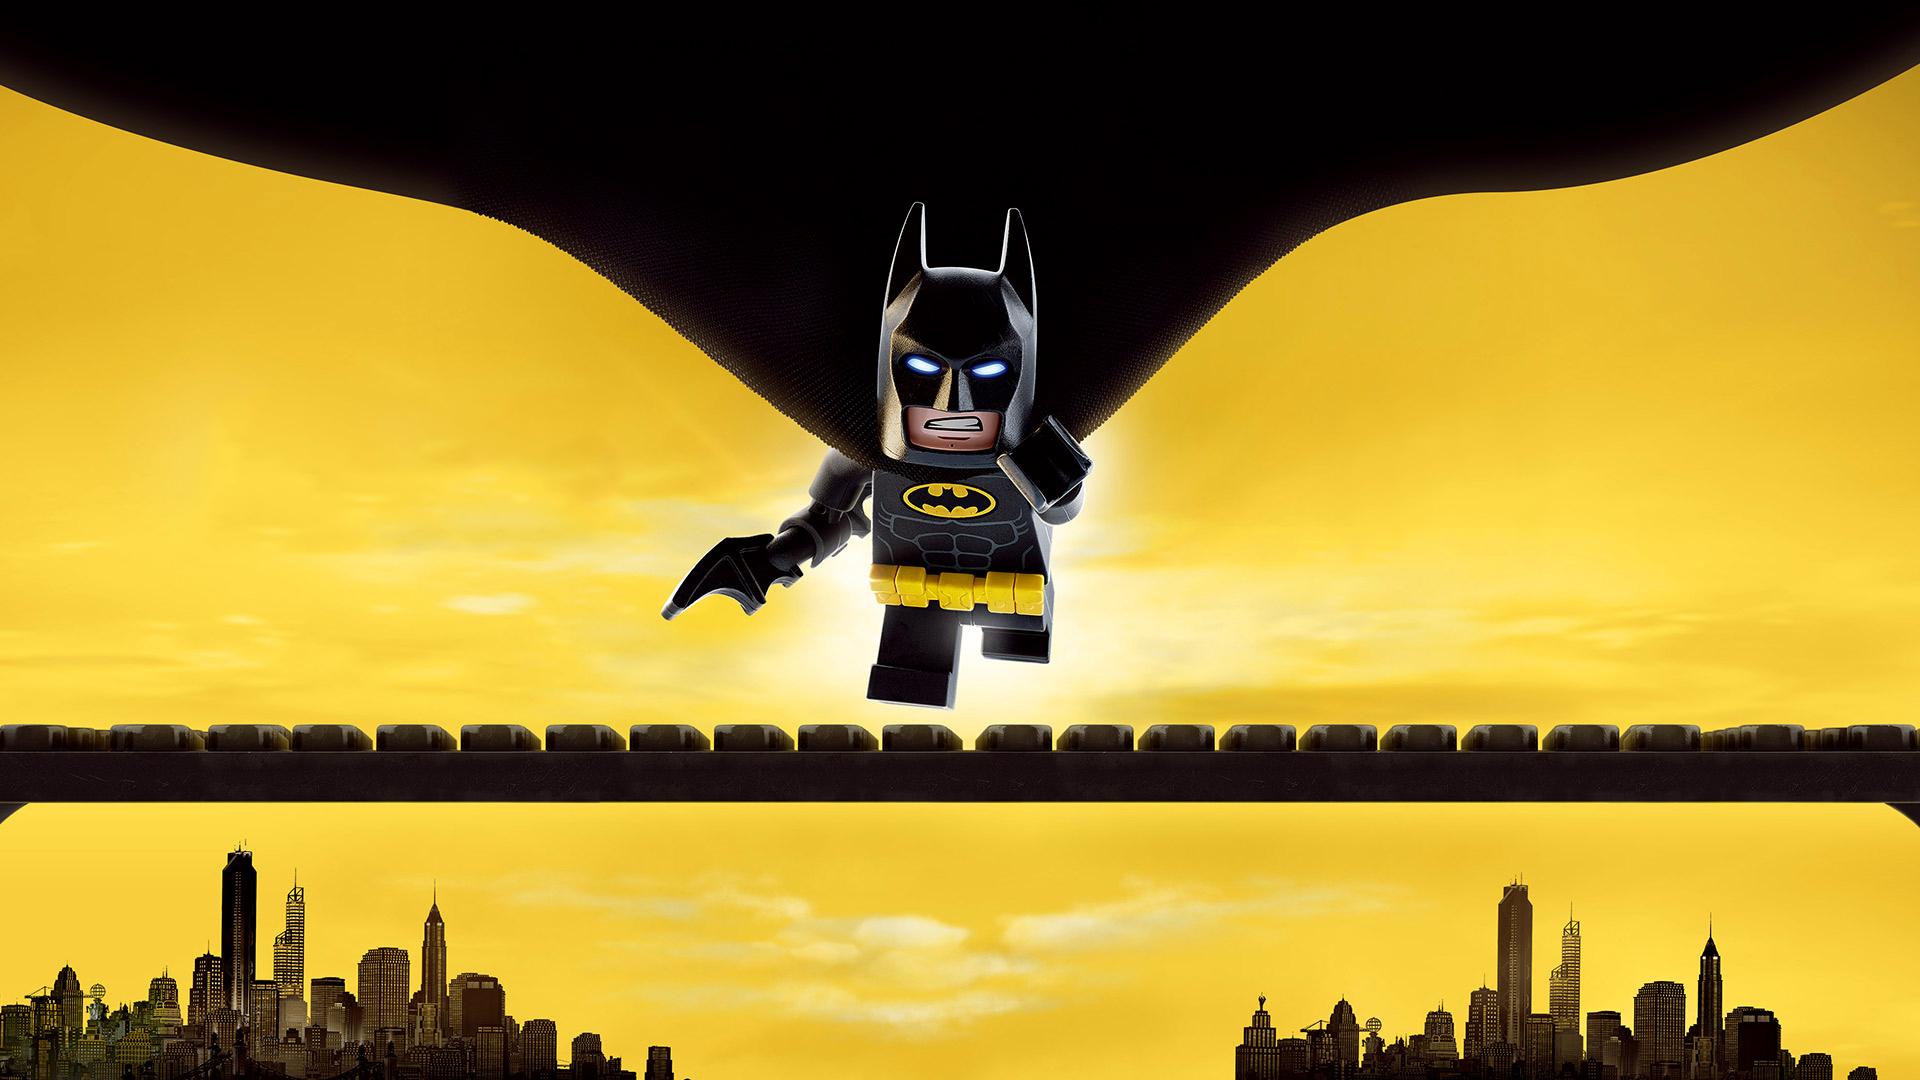 The Lego Batman Movie wallpaper 16